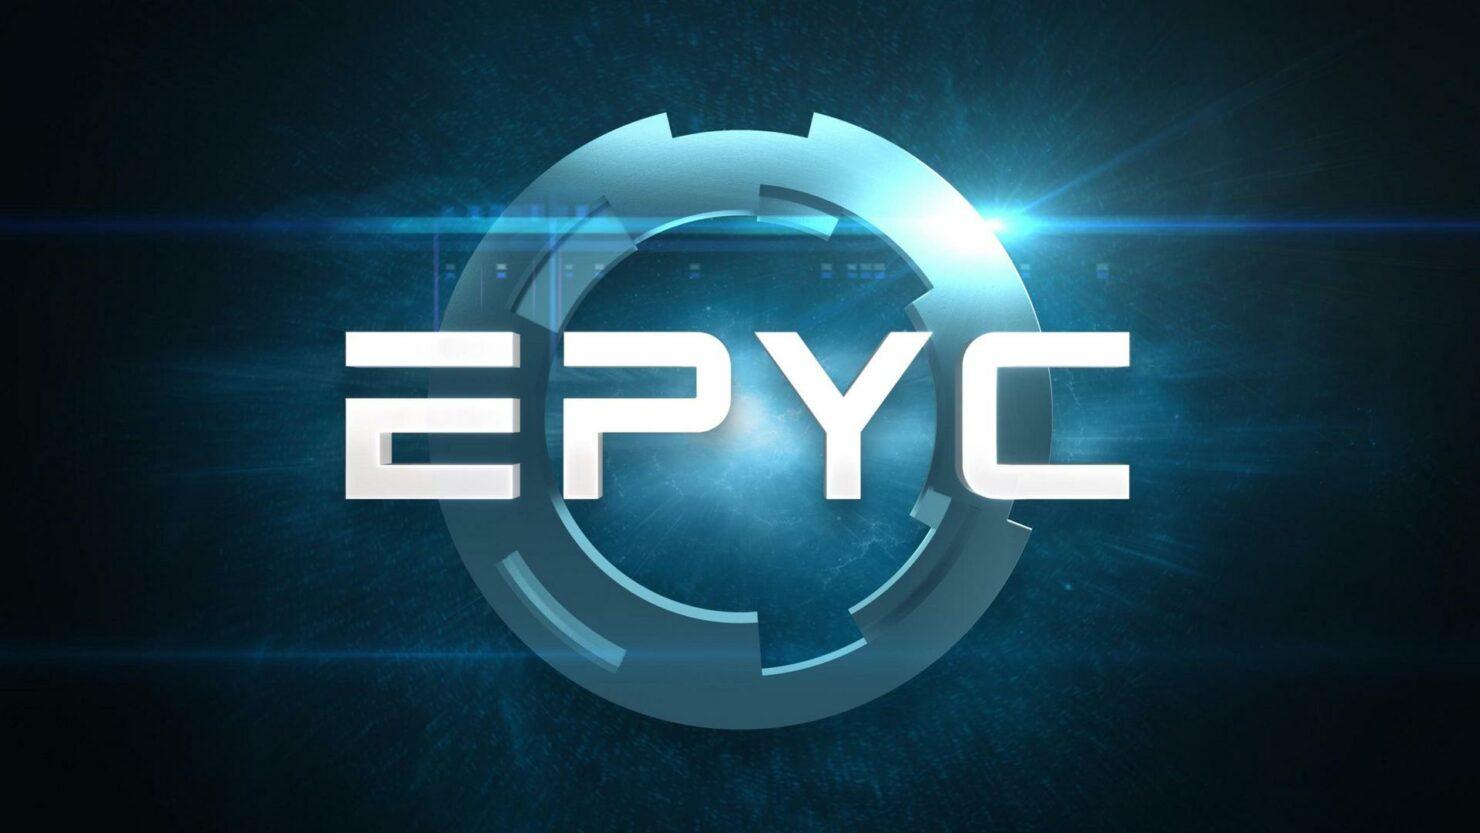 amd-epyc-processors_13